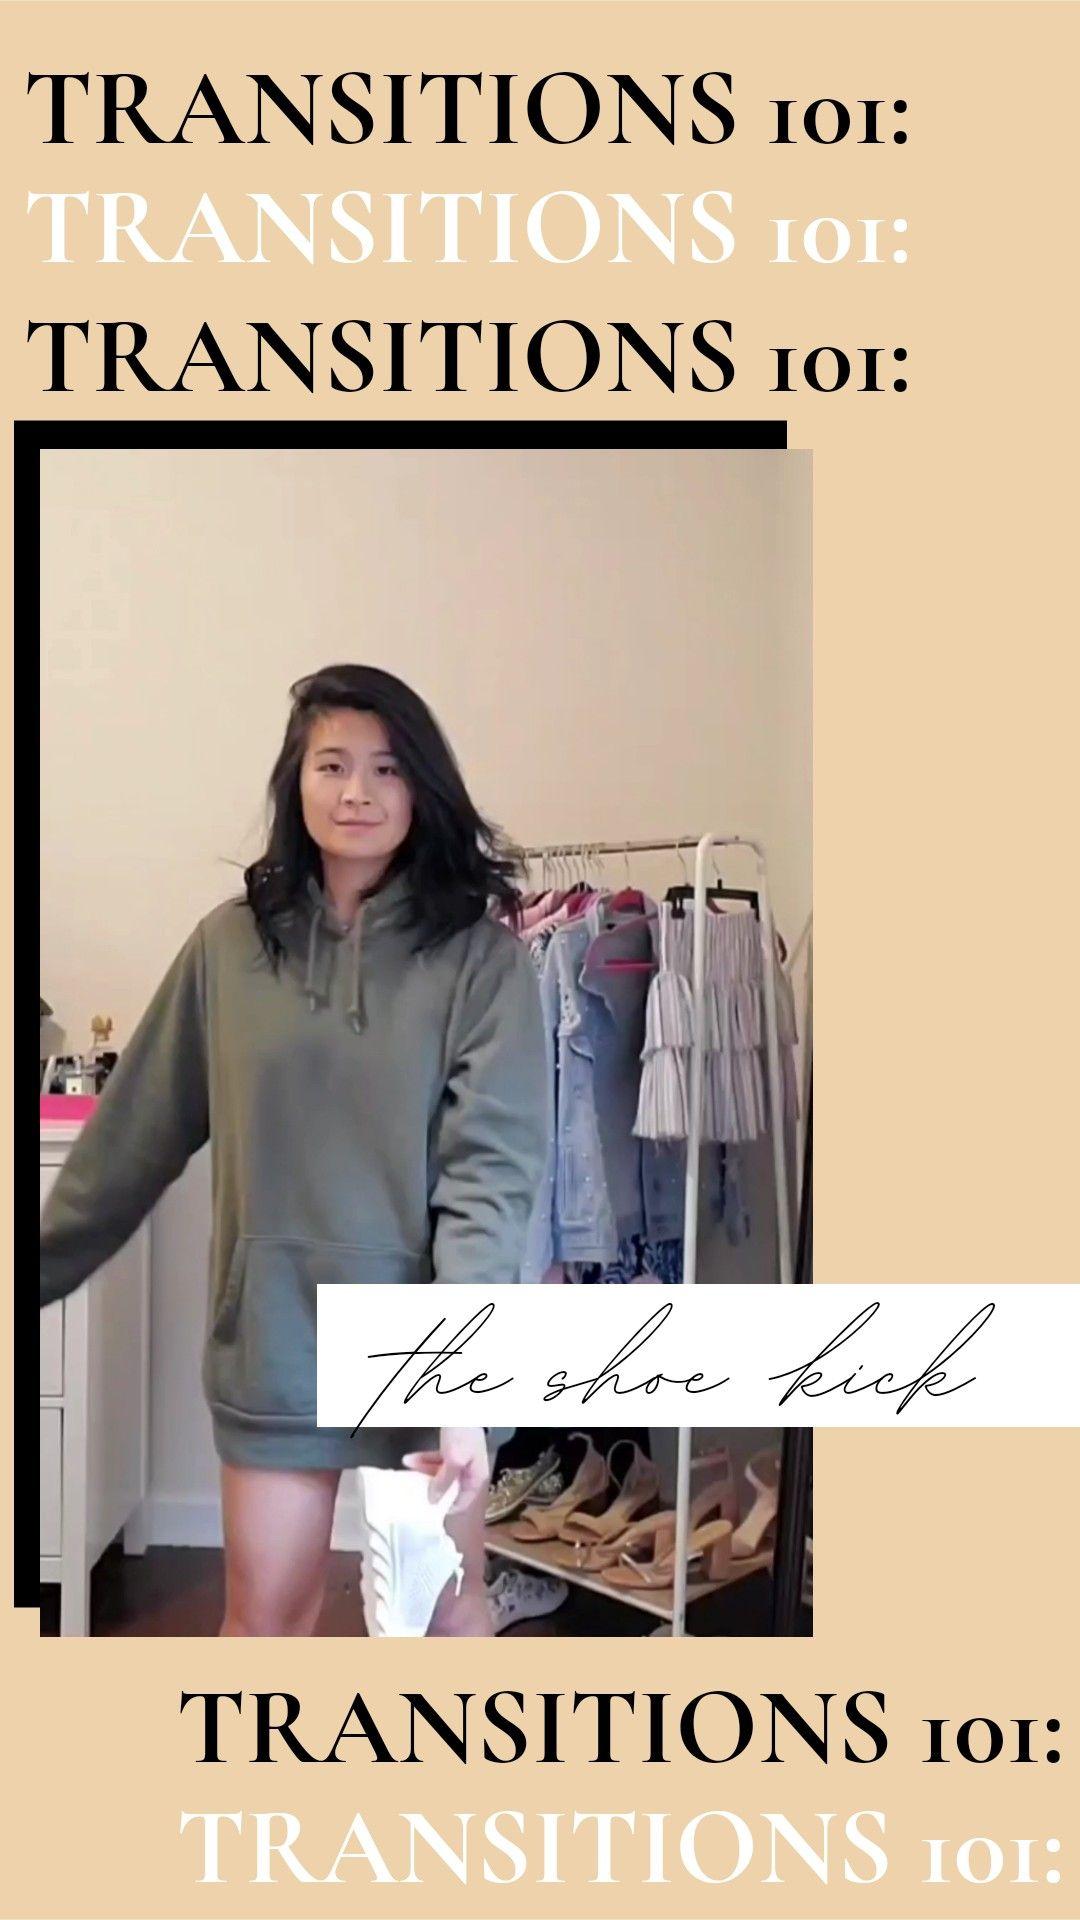 How To Do The Show Kick Transition On Tiktok Instagram Reels Social Media Tips Instagram Tips Blog Social Media